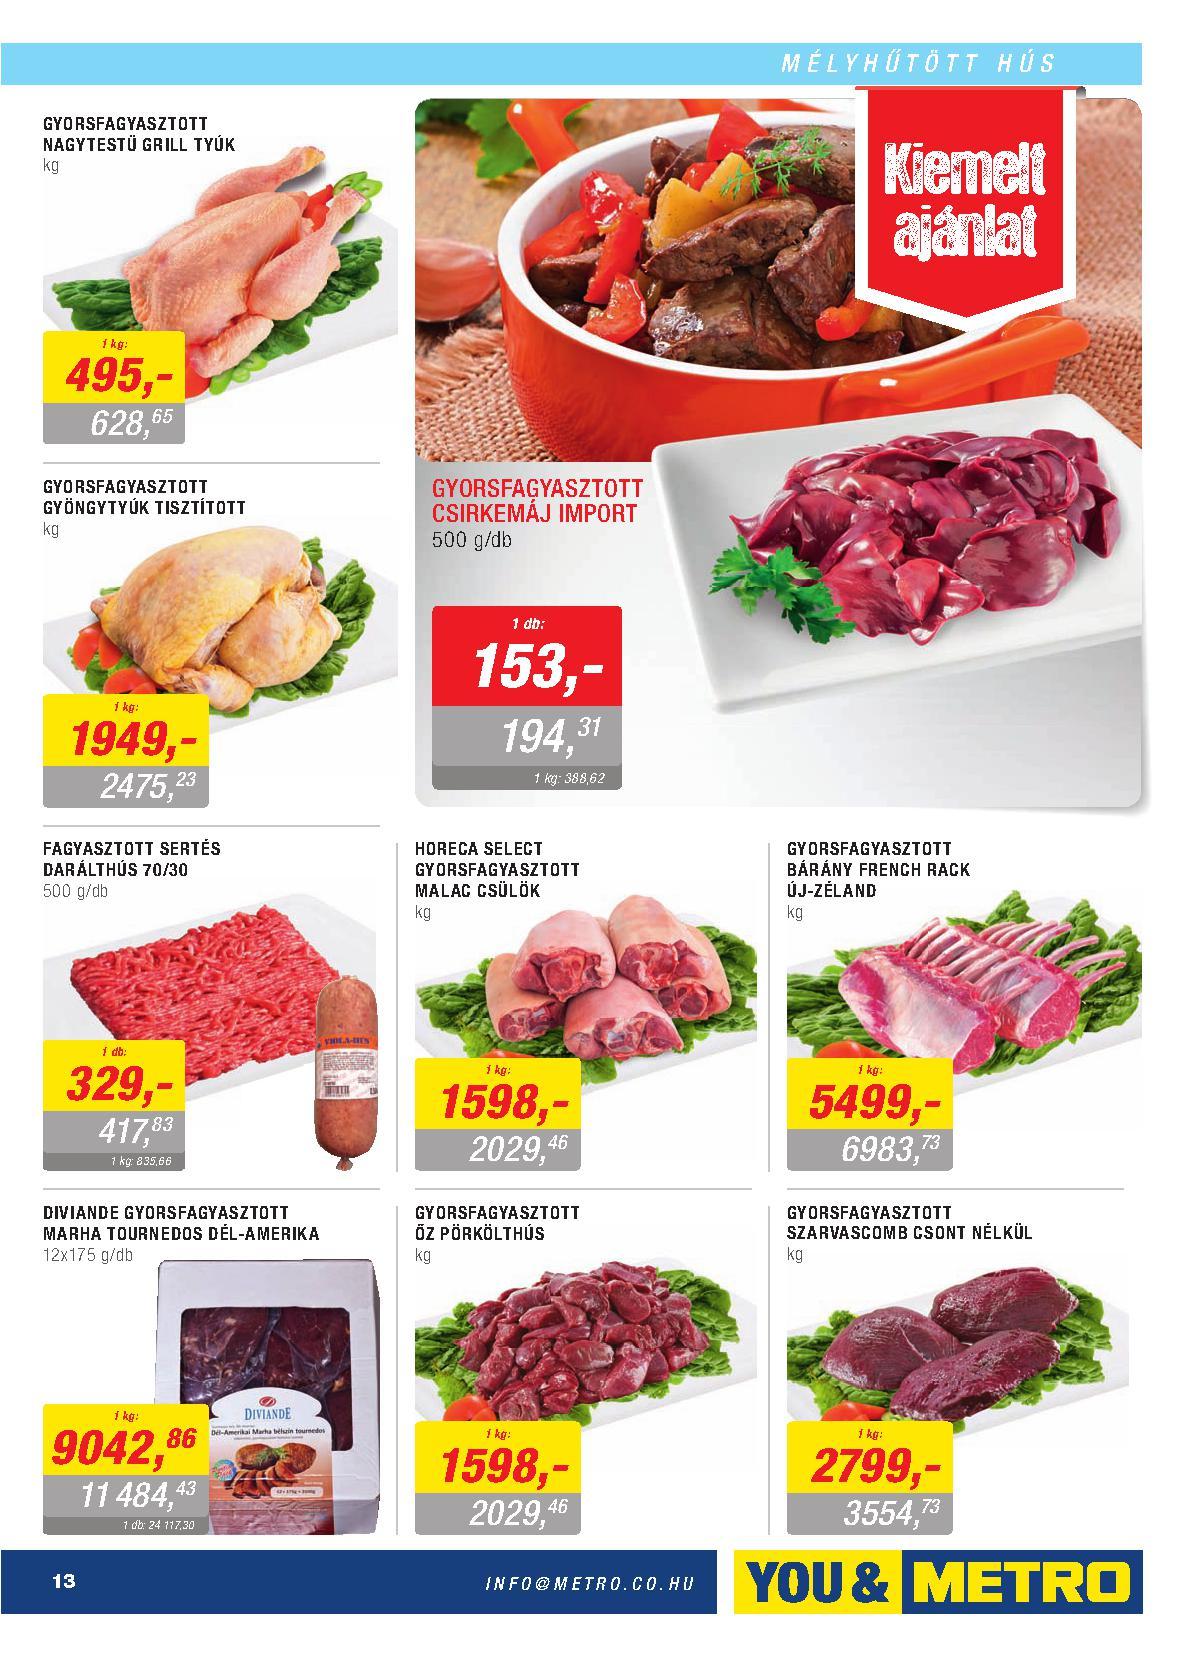 Metro Mađarska akcija odlična ponuda prehrane